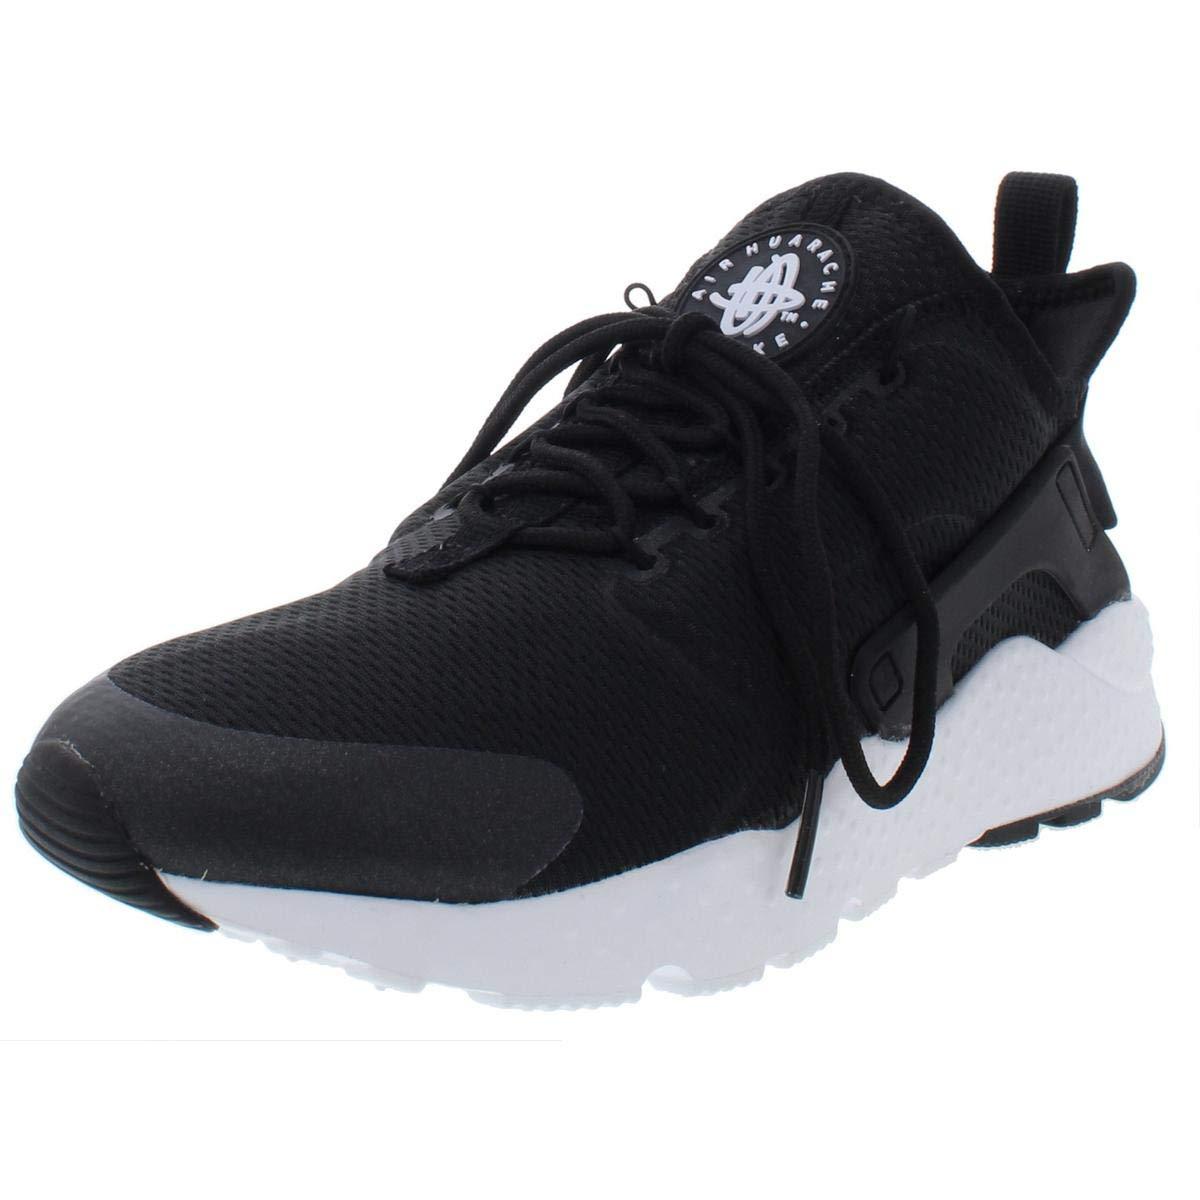 promo code 6e776 f17f6 Galleon - Nike Women s Air Huarache Run, Dark Grey White Deep Royal Blue,  8.5 Us